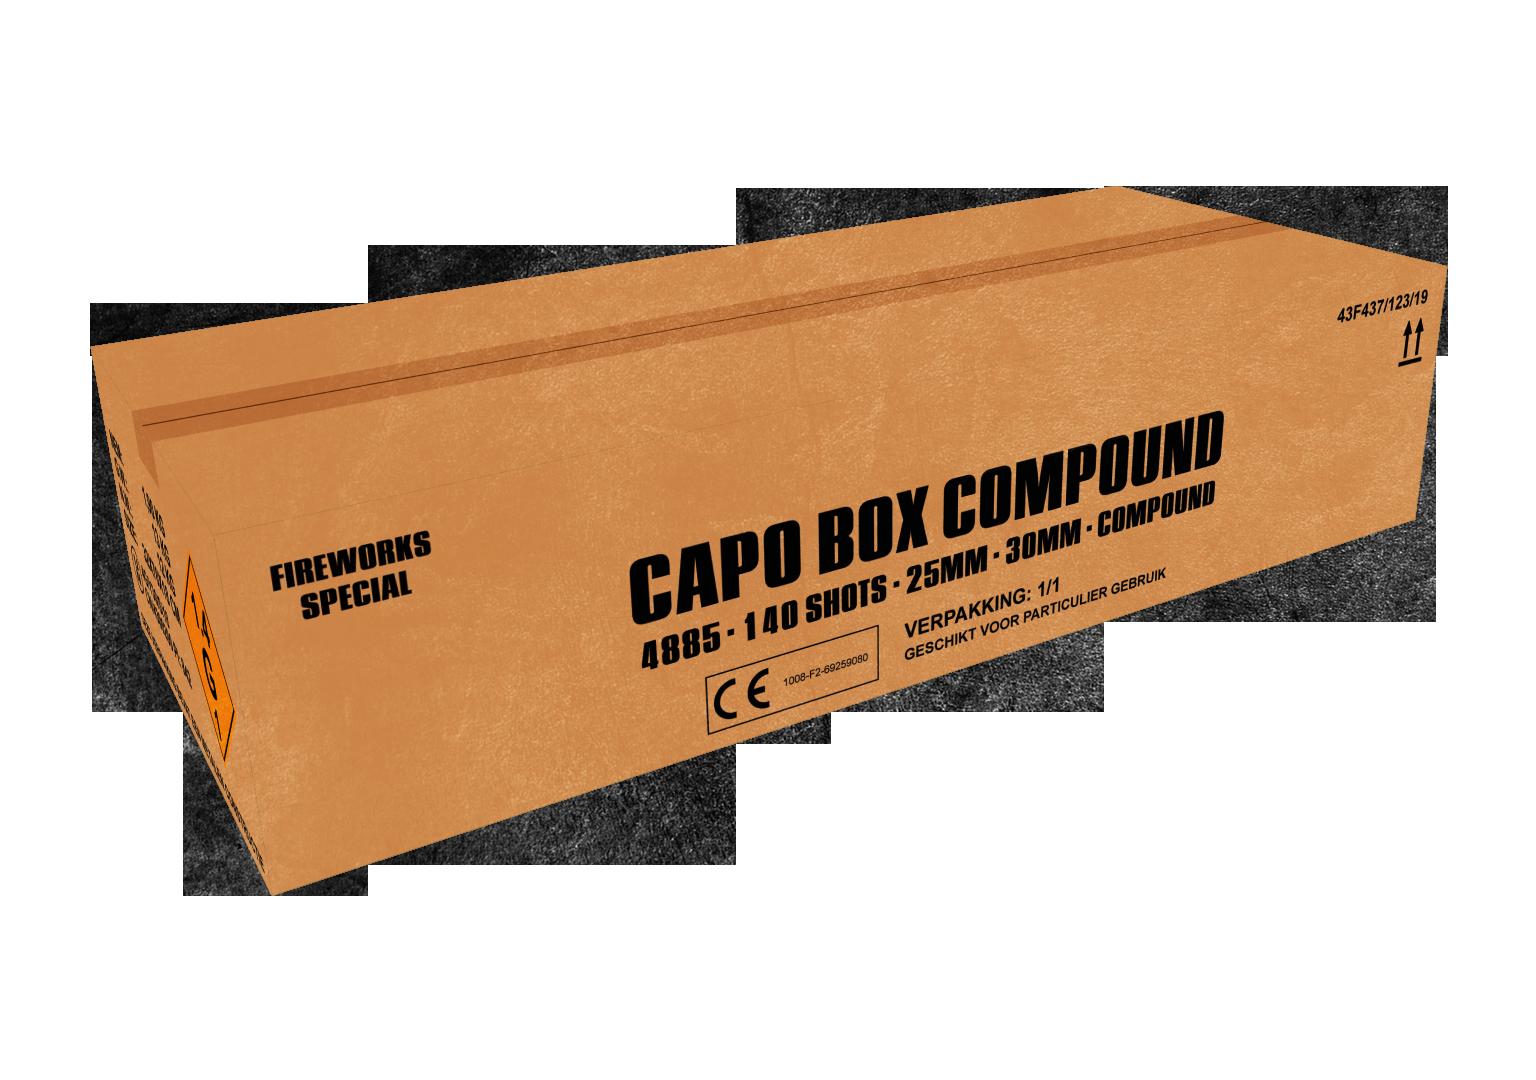 ART. 4885 CAPO BOX WAAIERBOX, 140 SHOTS COMPOUND